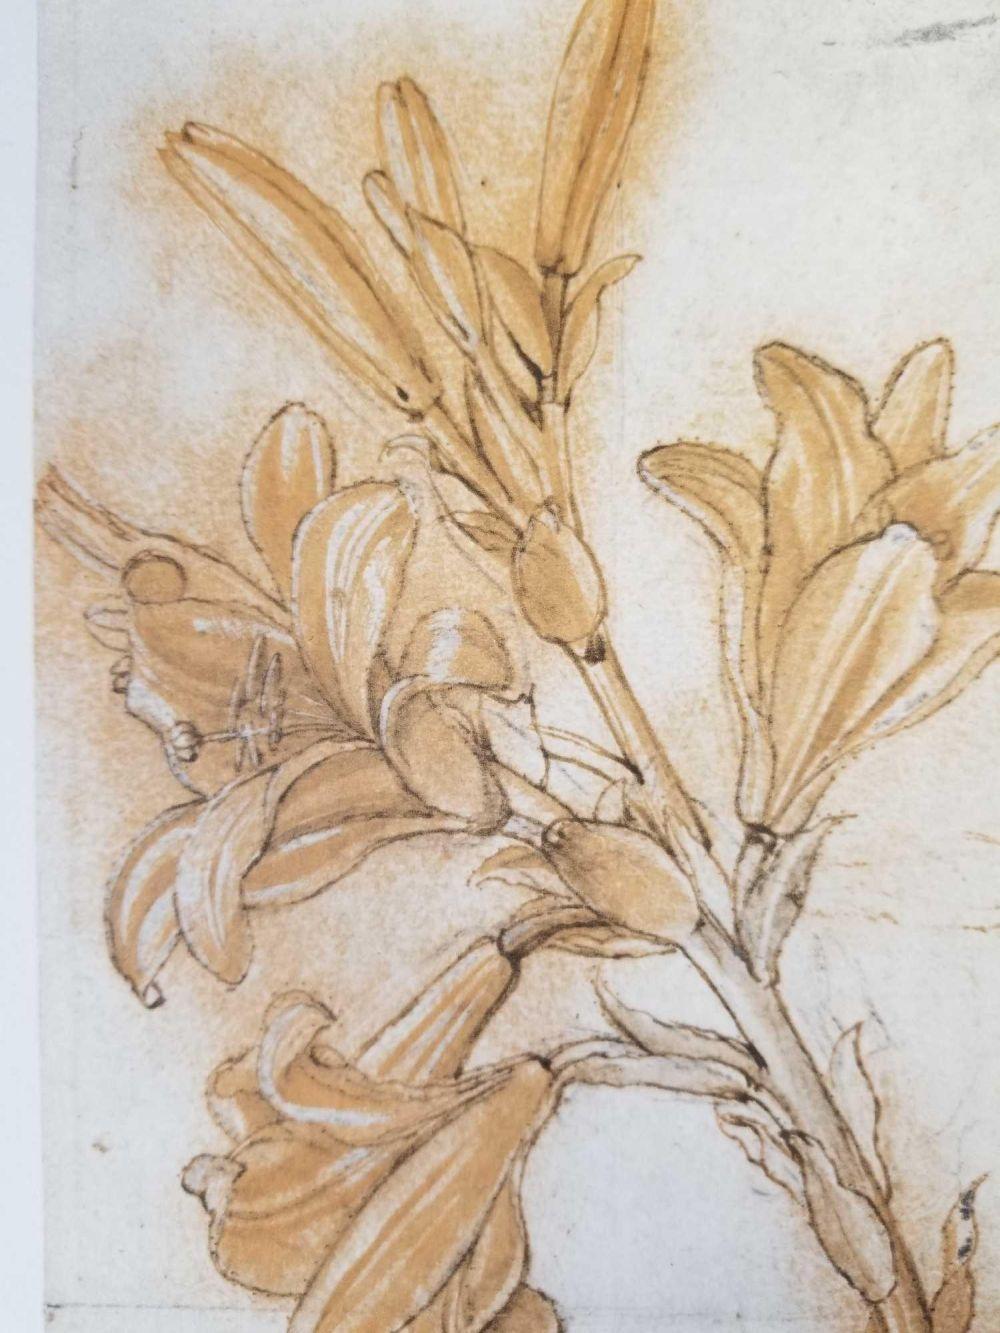 Lot 29: Lot of 3 Leonardo Da Vinci Prints from Royal Library Windsor Castle